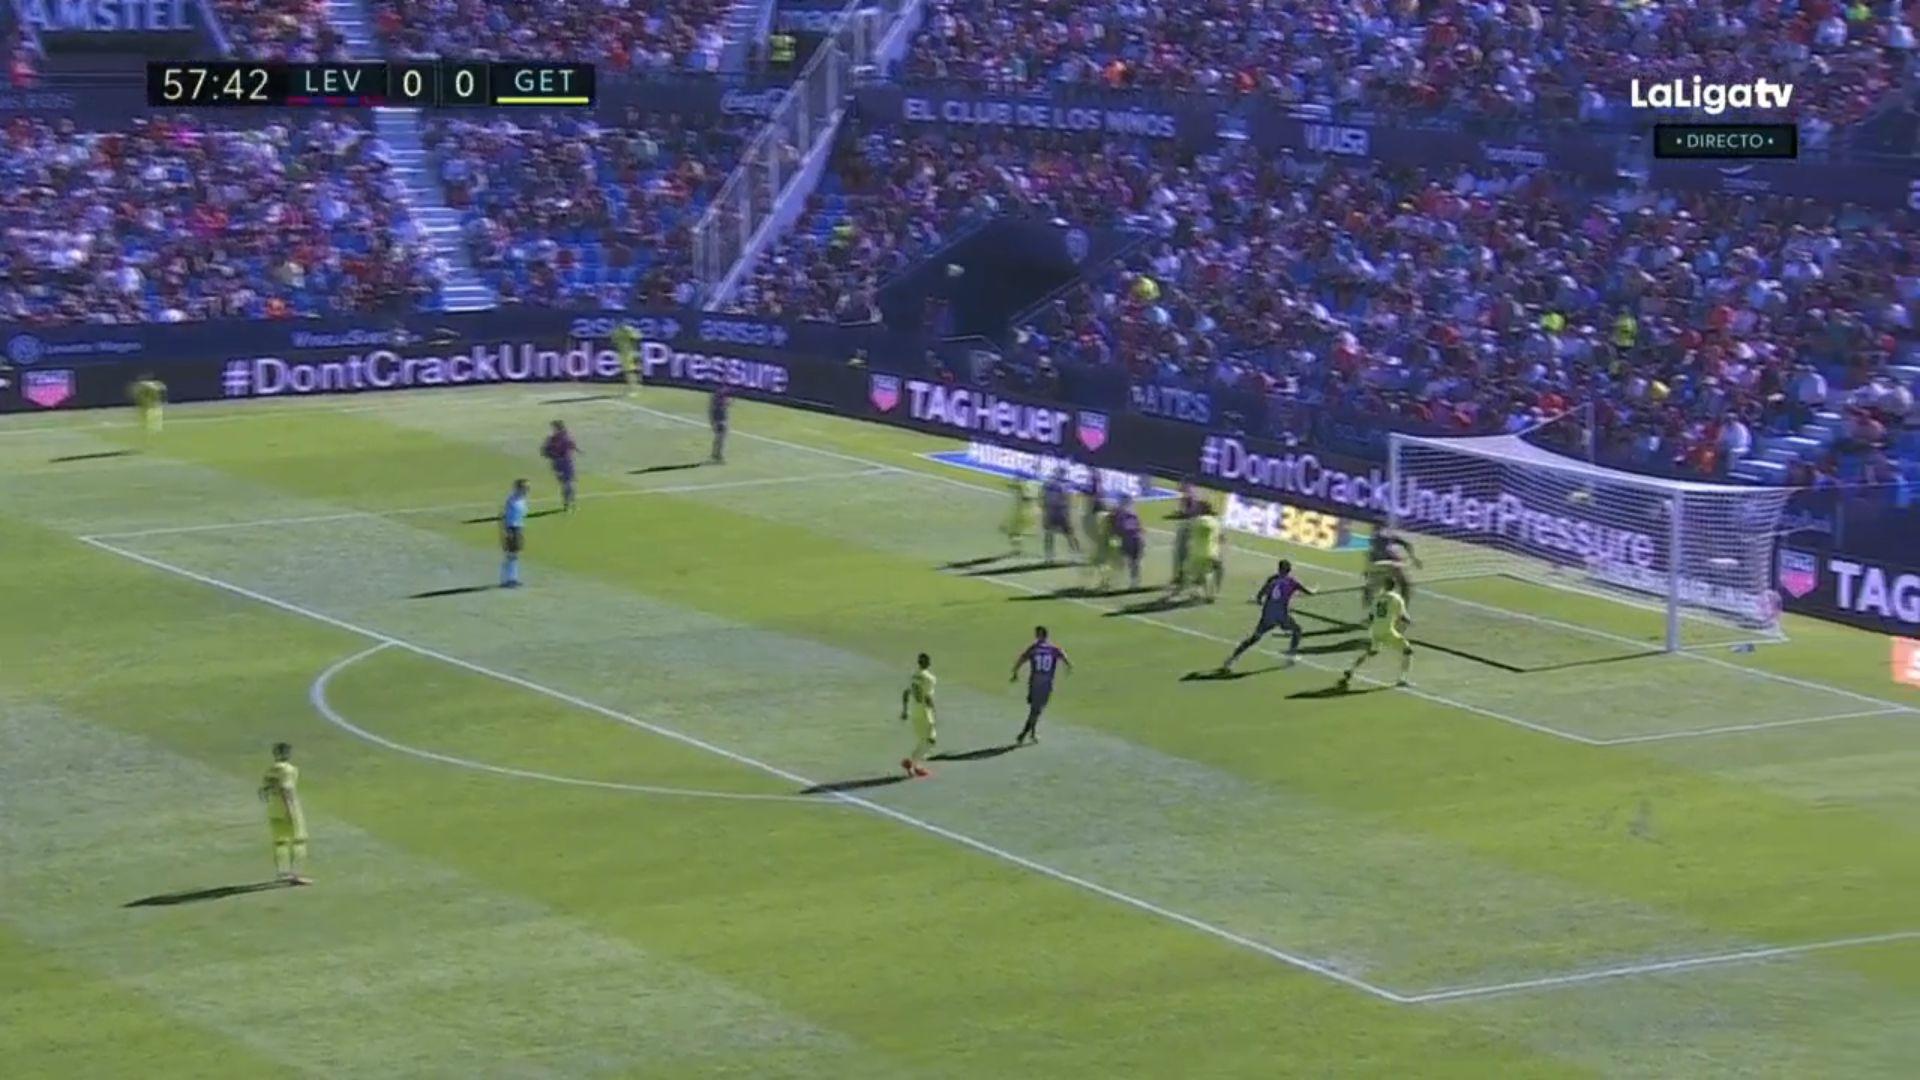 21-10-2017 - Levante 1-1 Getafe